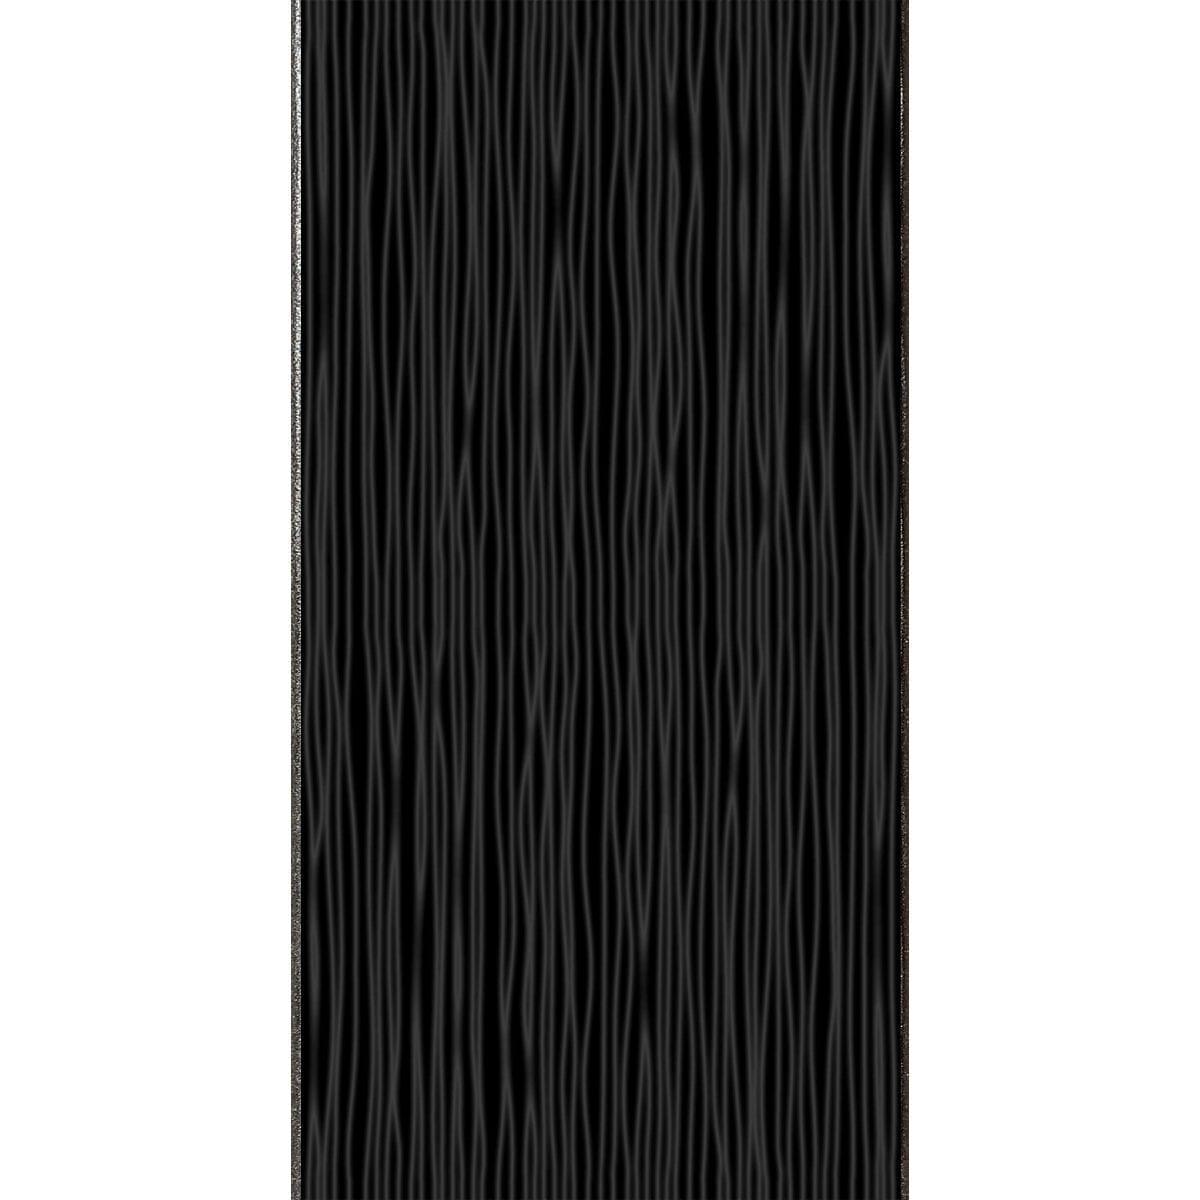 Lines Lux negro Lappato 12x24 W00016 2